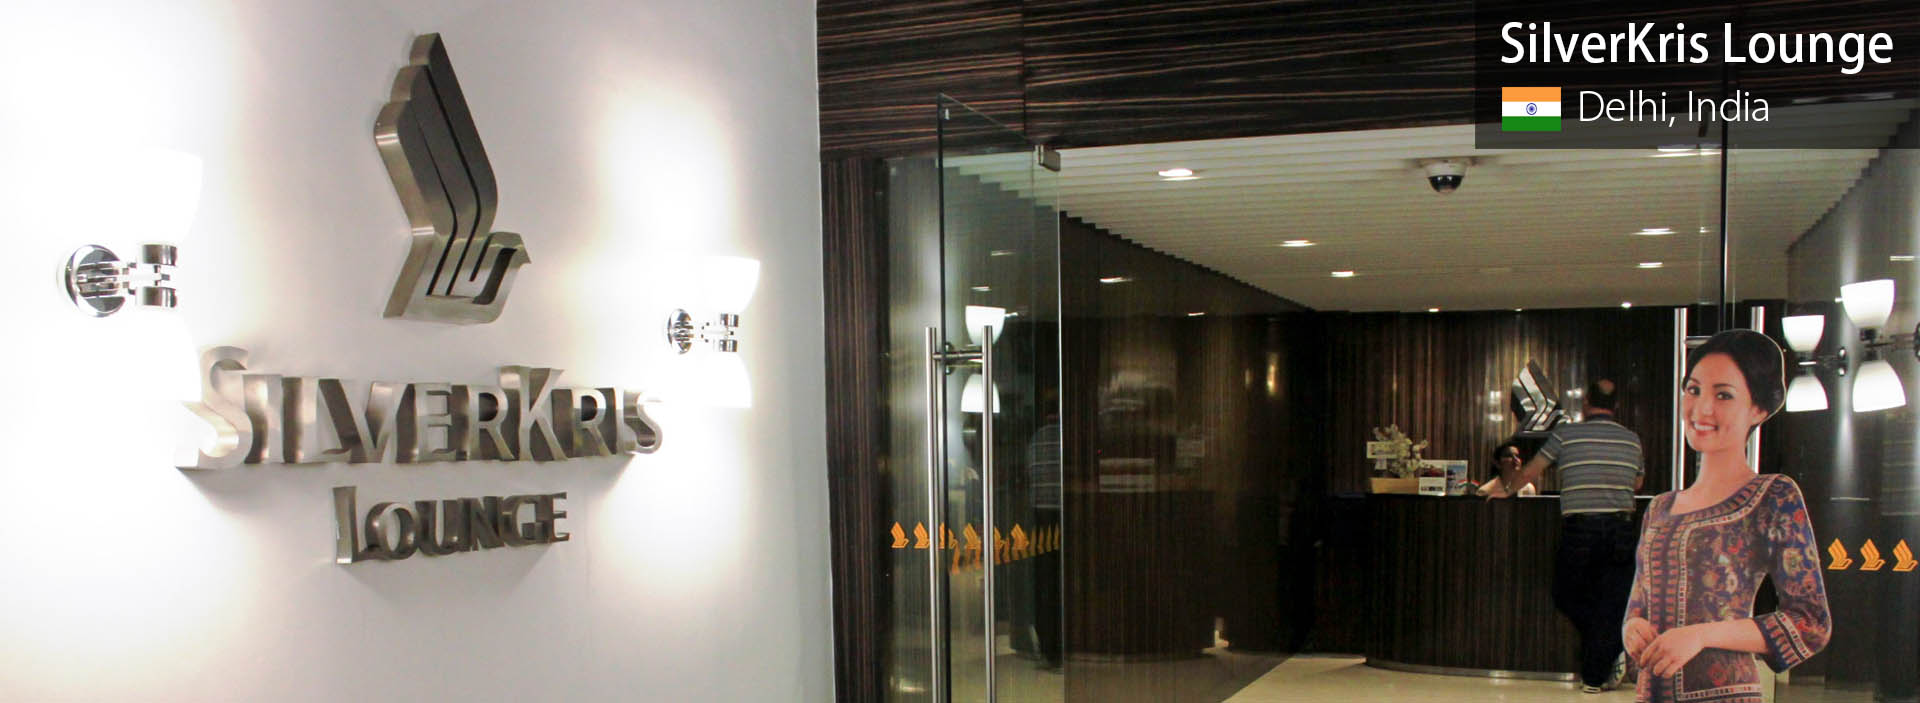 Review: Singapore Airlines SilverKris Lounge at Delhi Indira Gandhi International